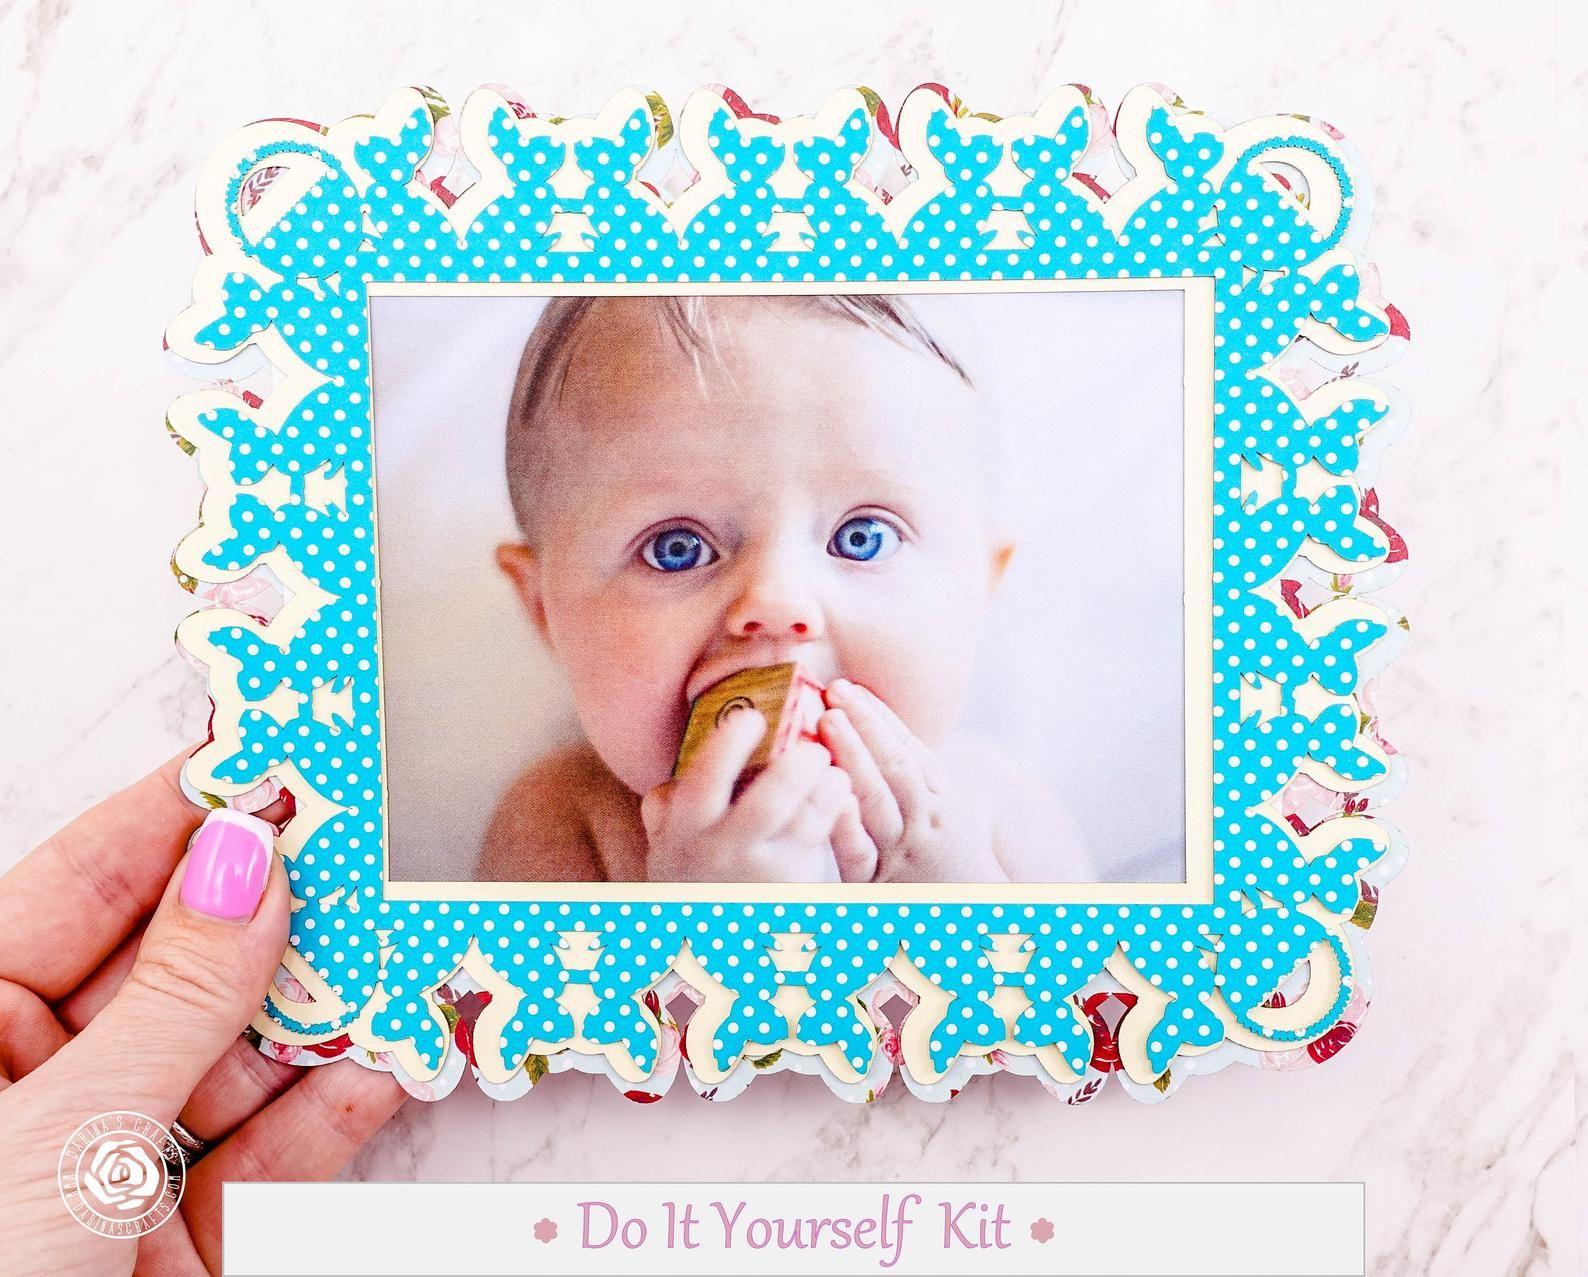 Diy Baby Boy Frame Kit Diy Scrapbook Kit With Wood Embellishments